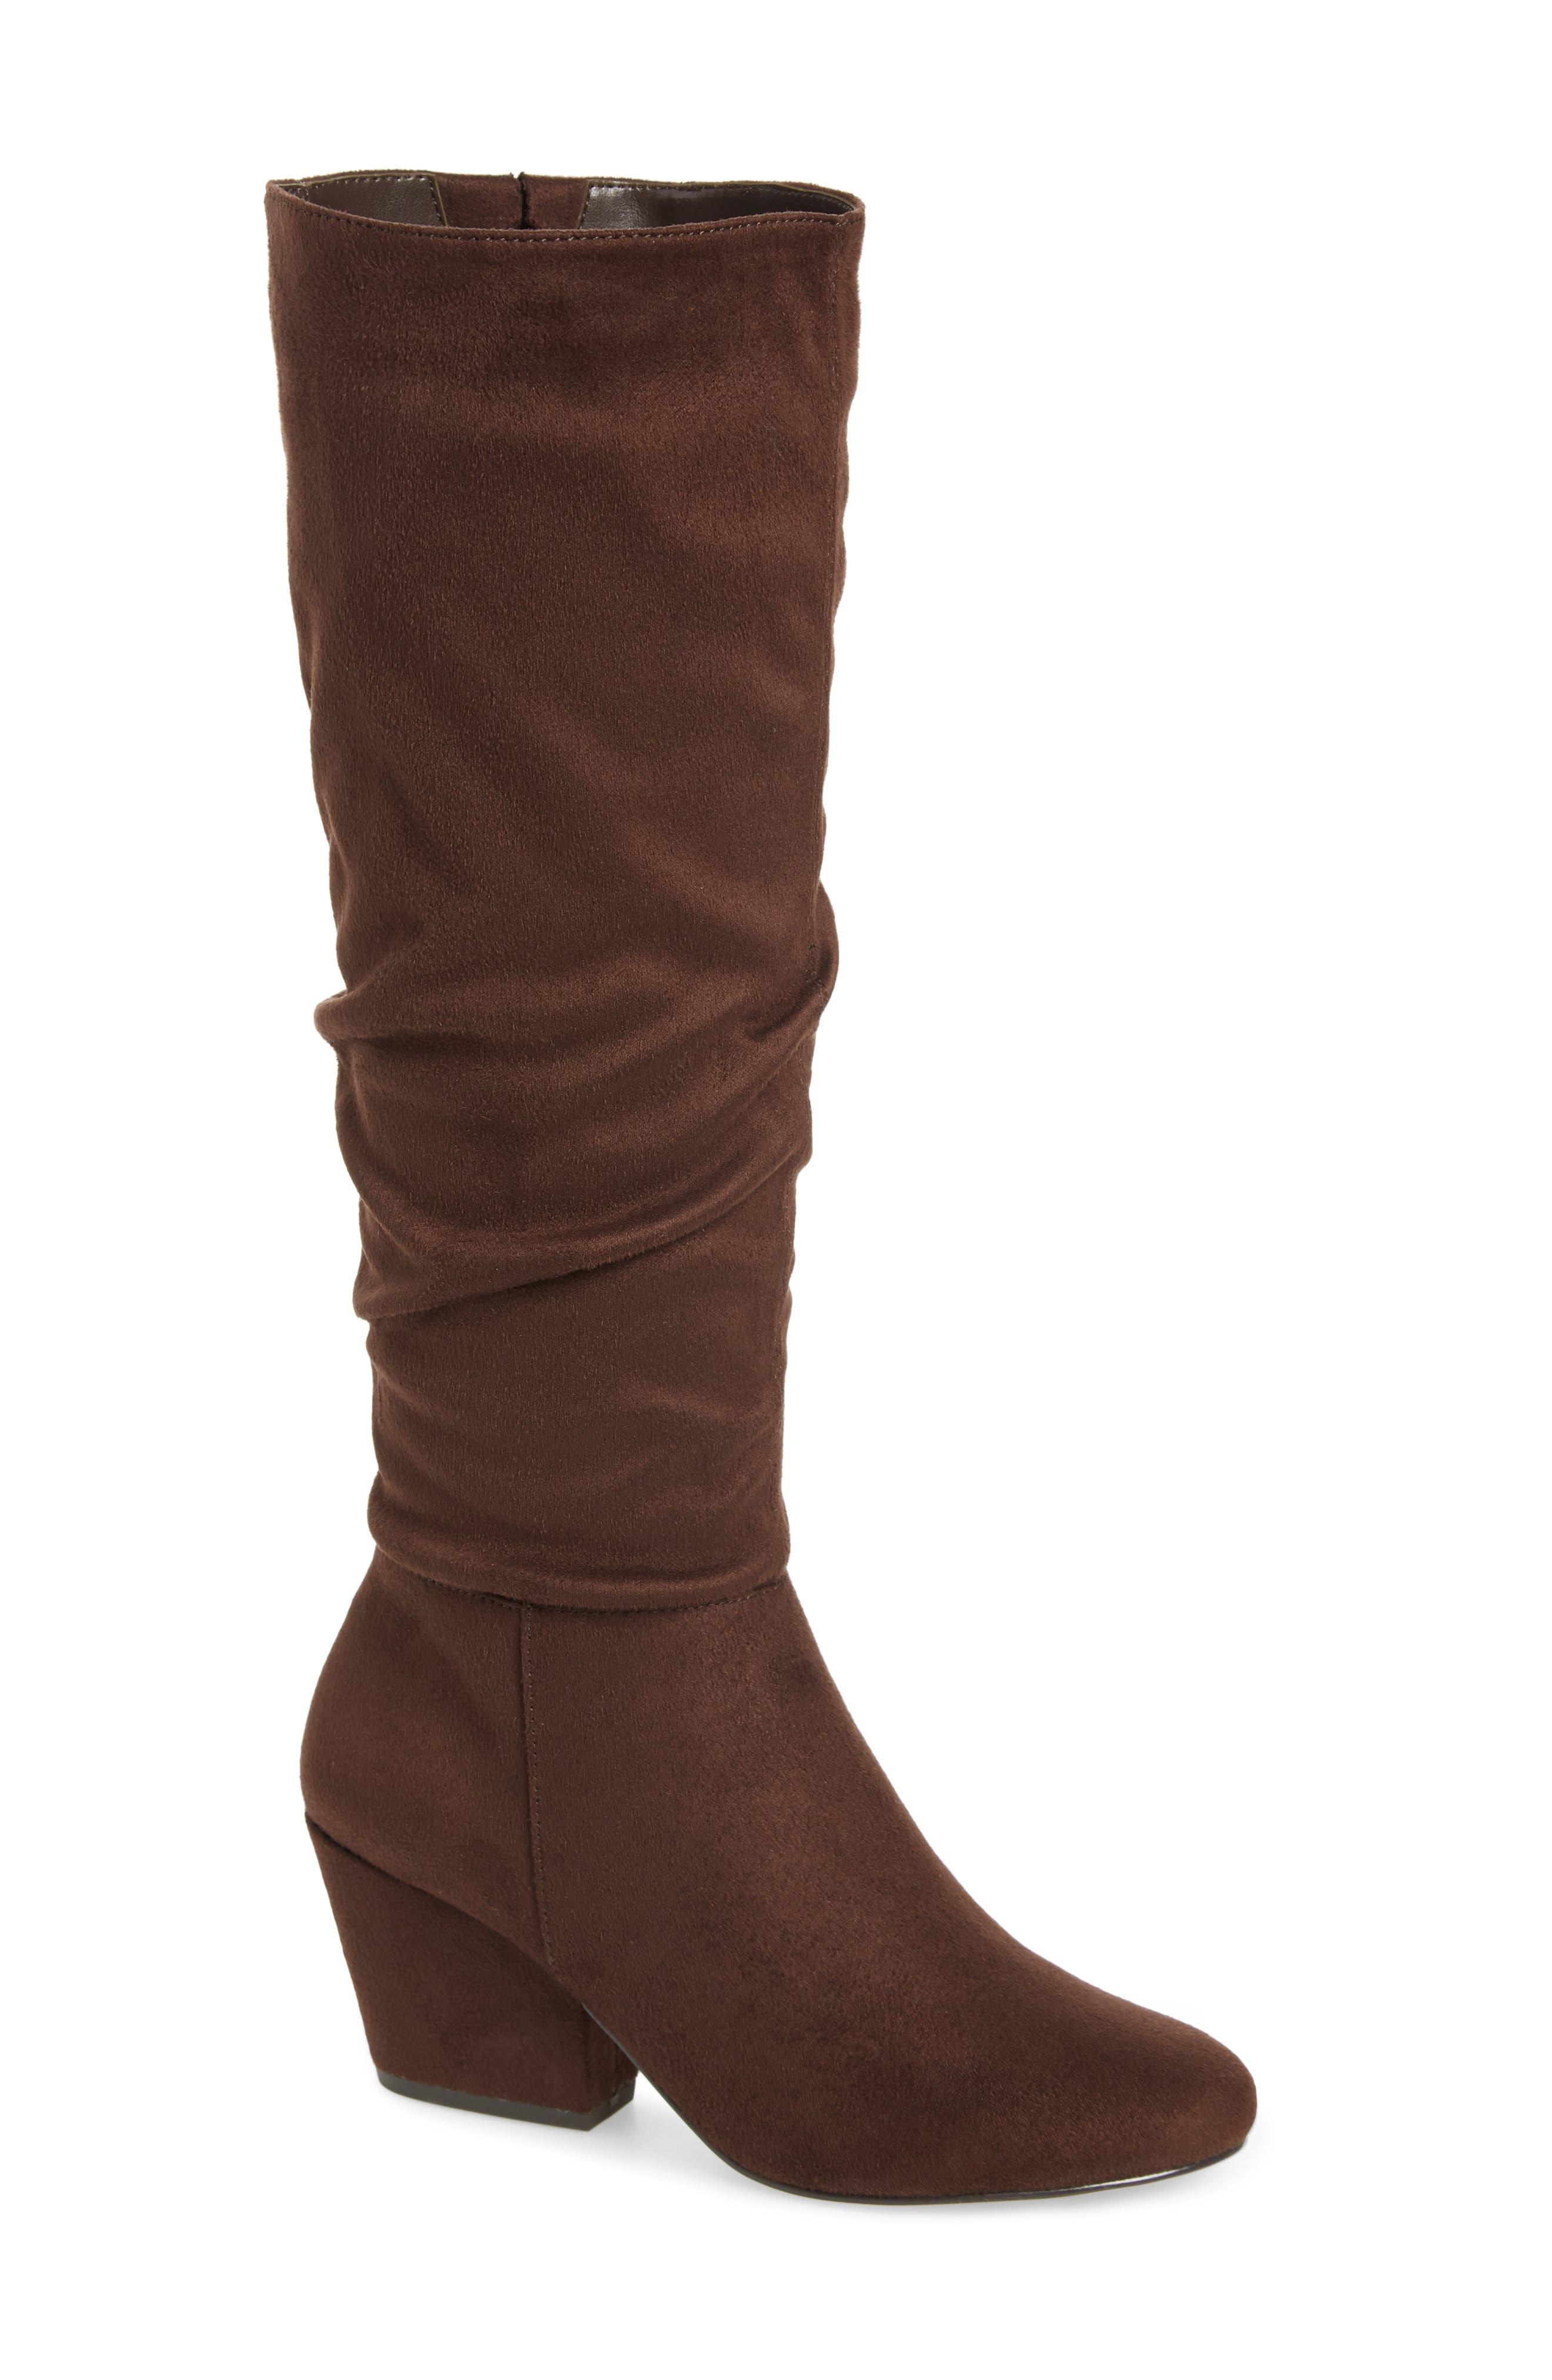 Bella Vita Karen Ii Knee High Slouch Boot, Brown